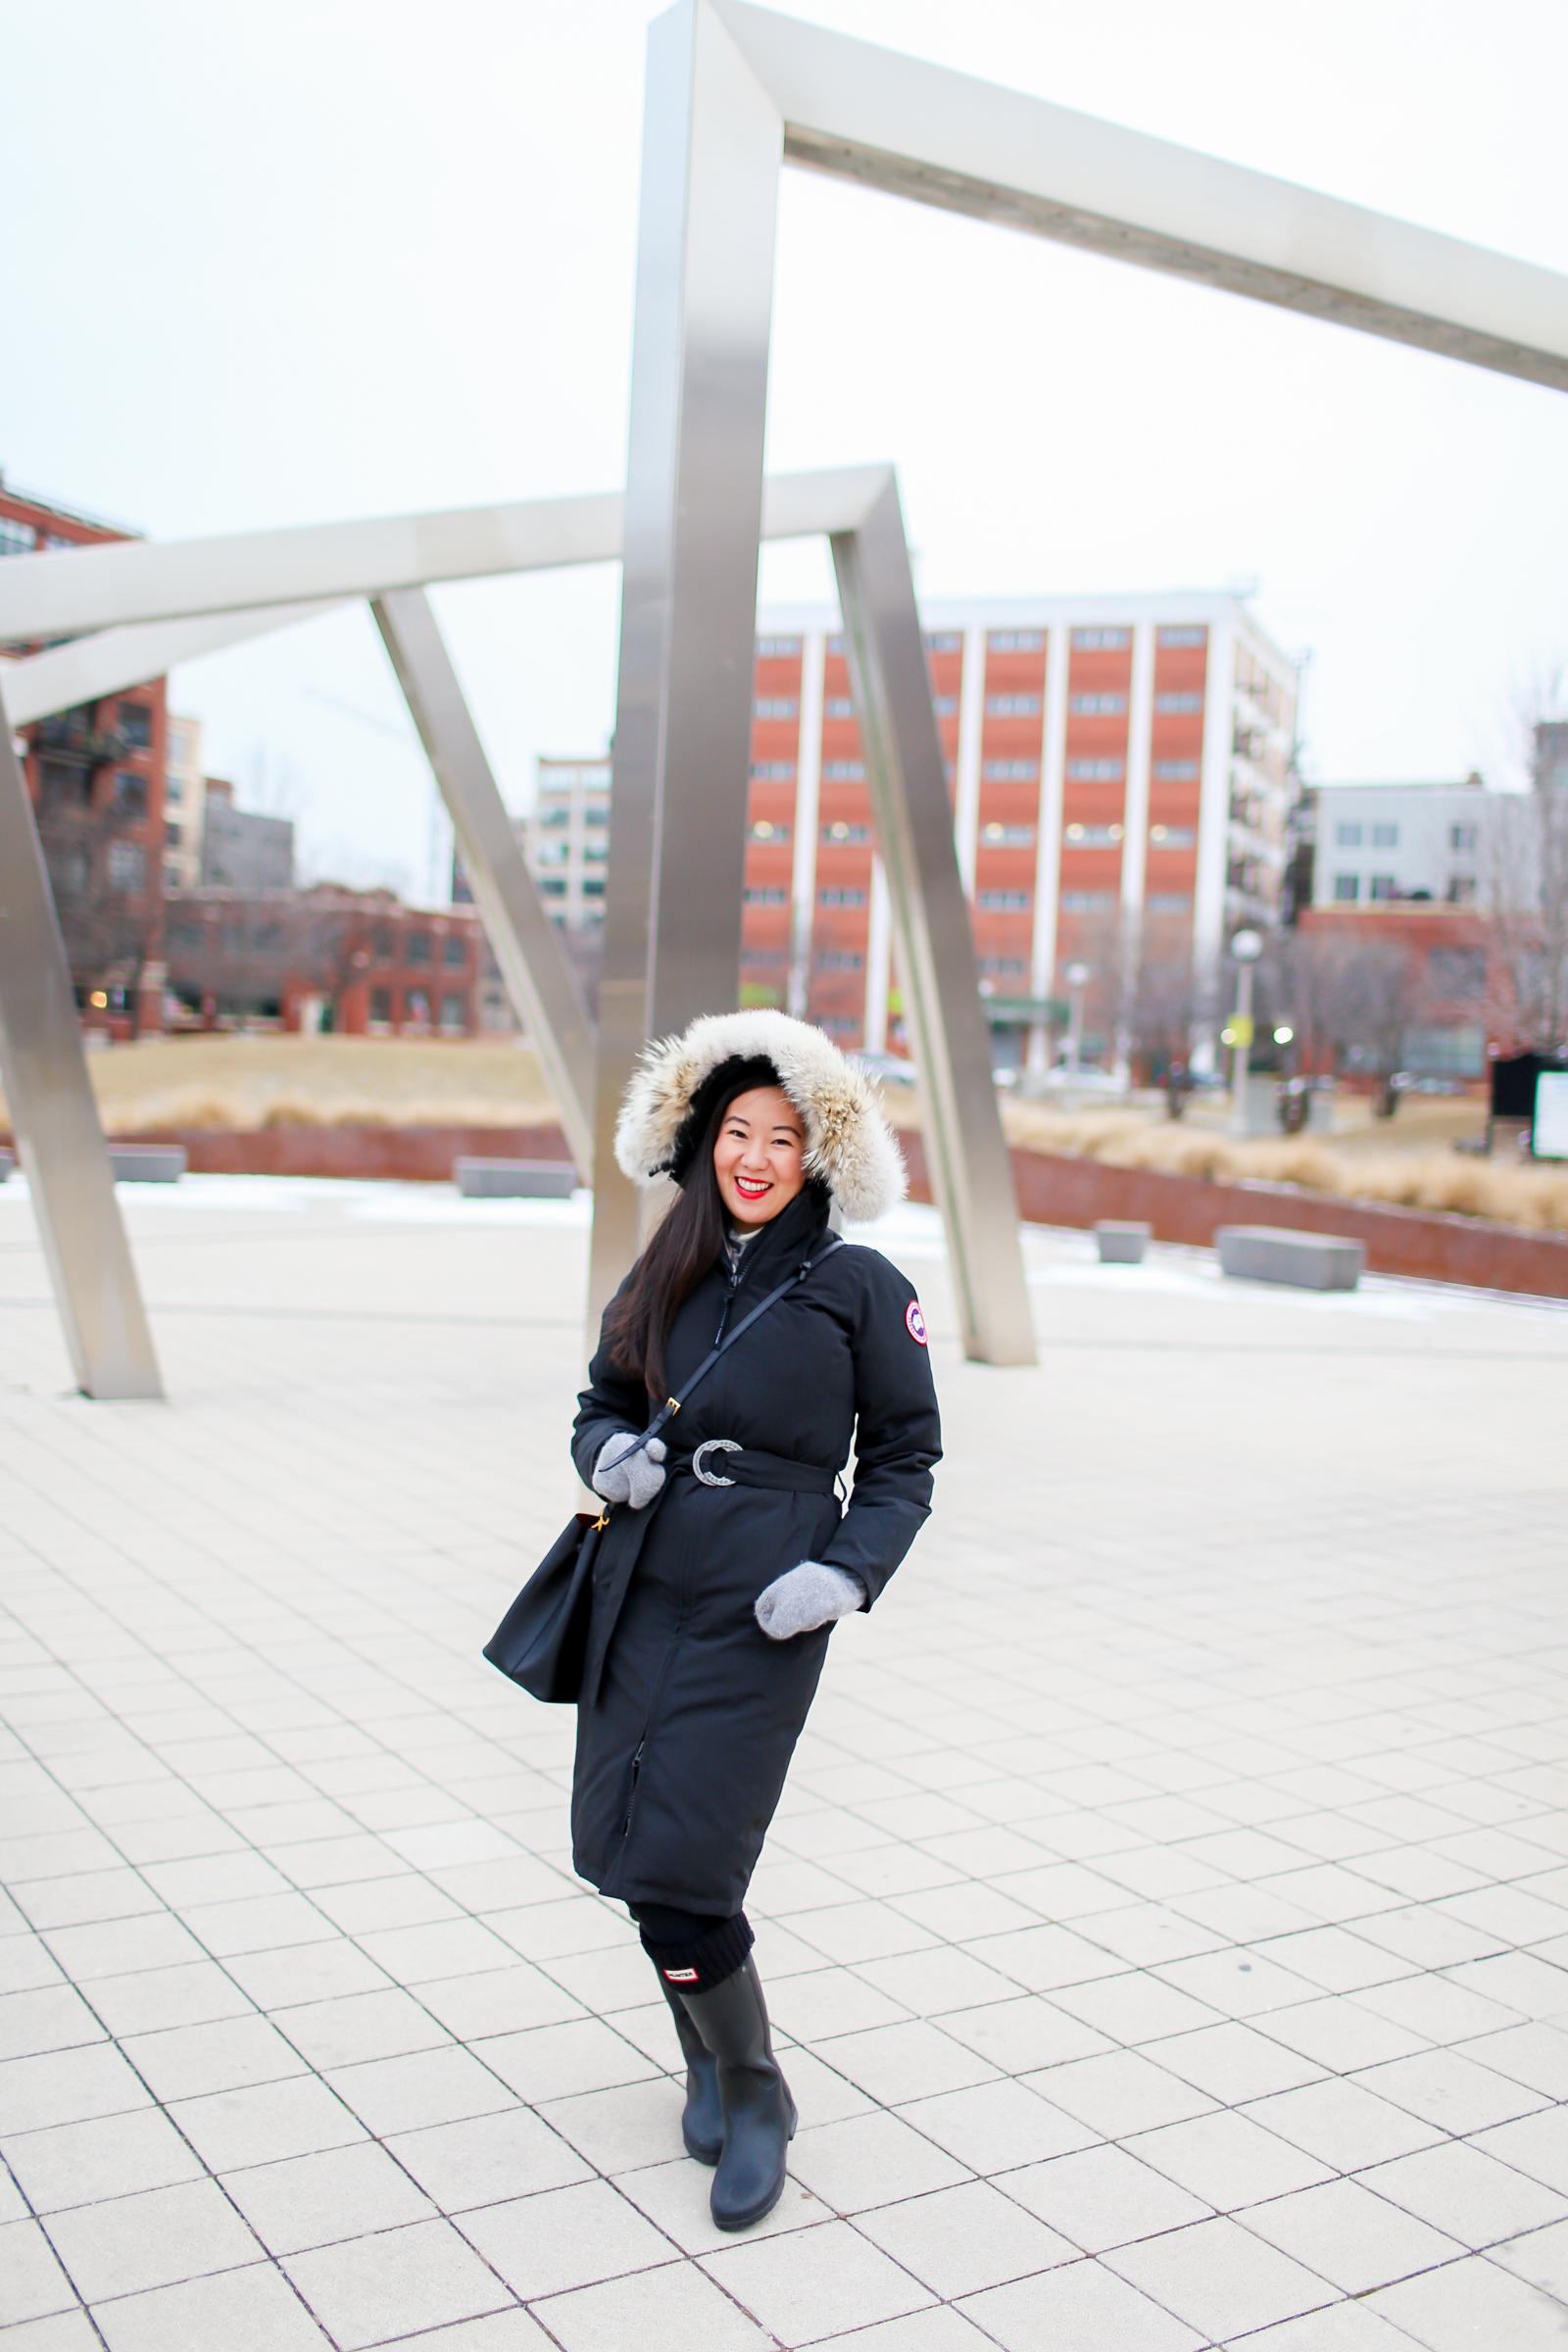 c8451af9907 Is a Canada Goose Coat Worth It? - Tia Perciballi Fashion ...